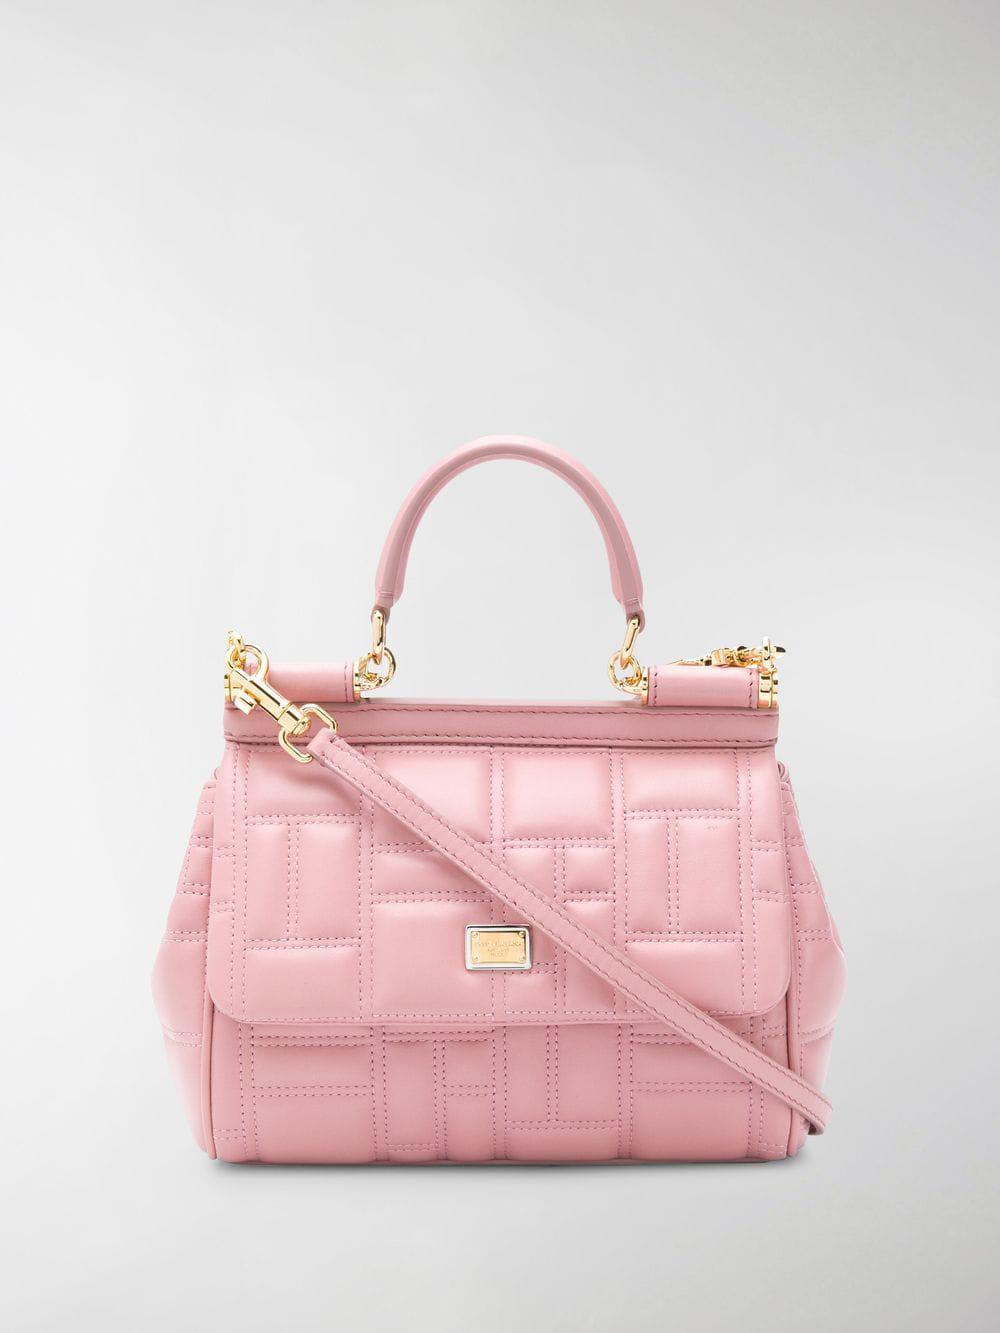 Dolce   Gabbana Sicily Tote Bag in Pink - Lyst e90fdff3e7560